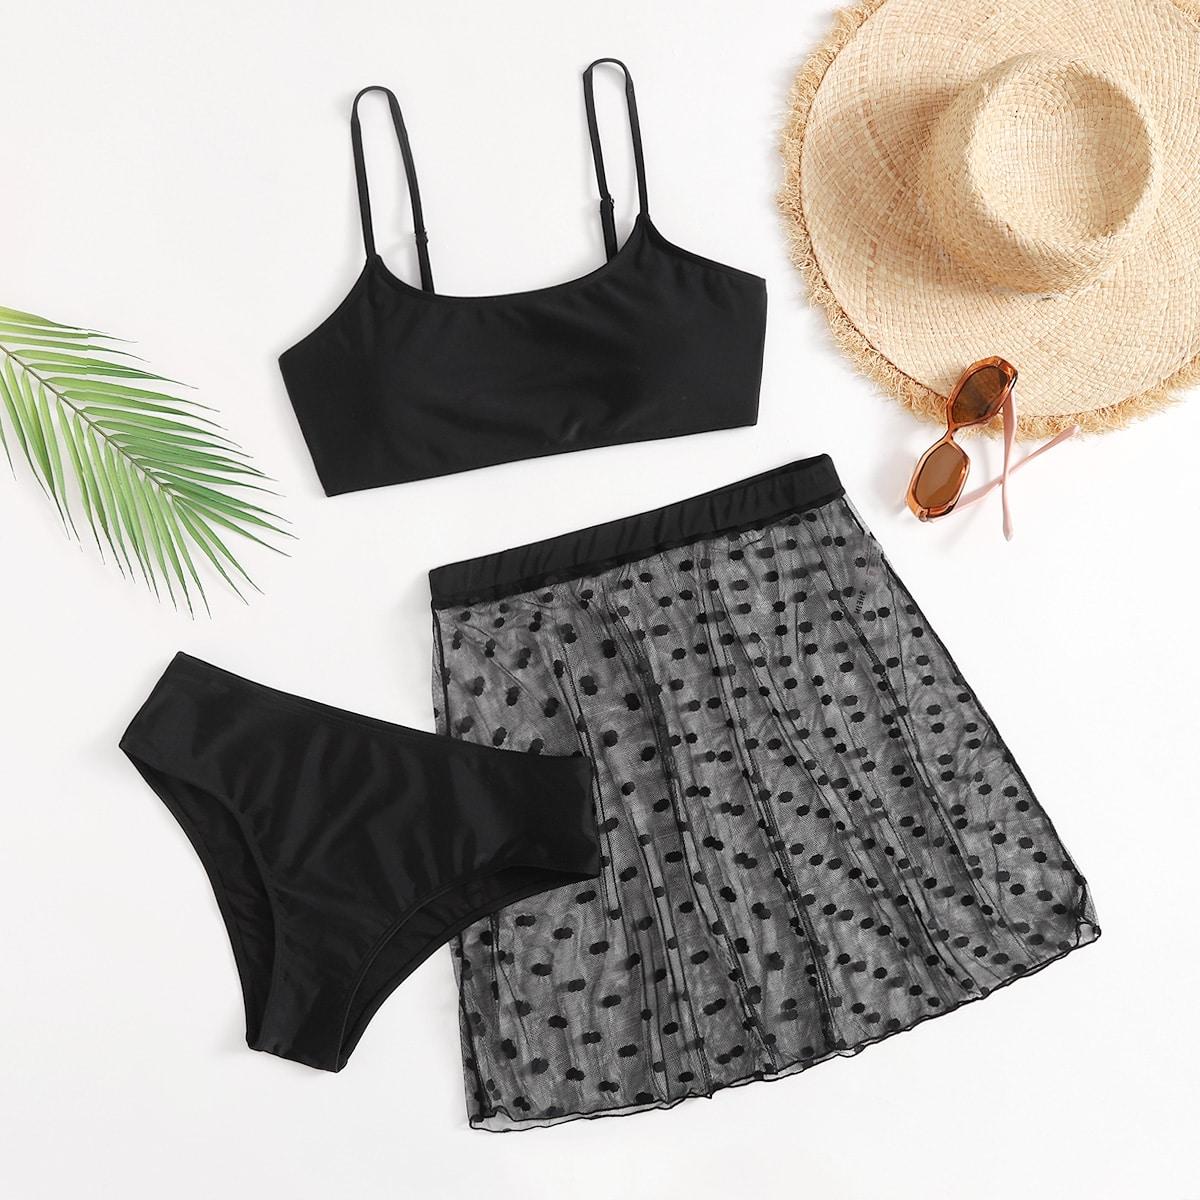 3pack Plus High Waisted Bikini Swimsuit & Beach Skirt